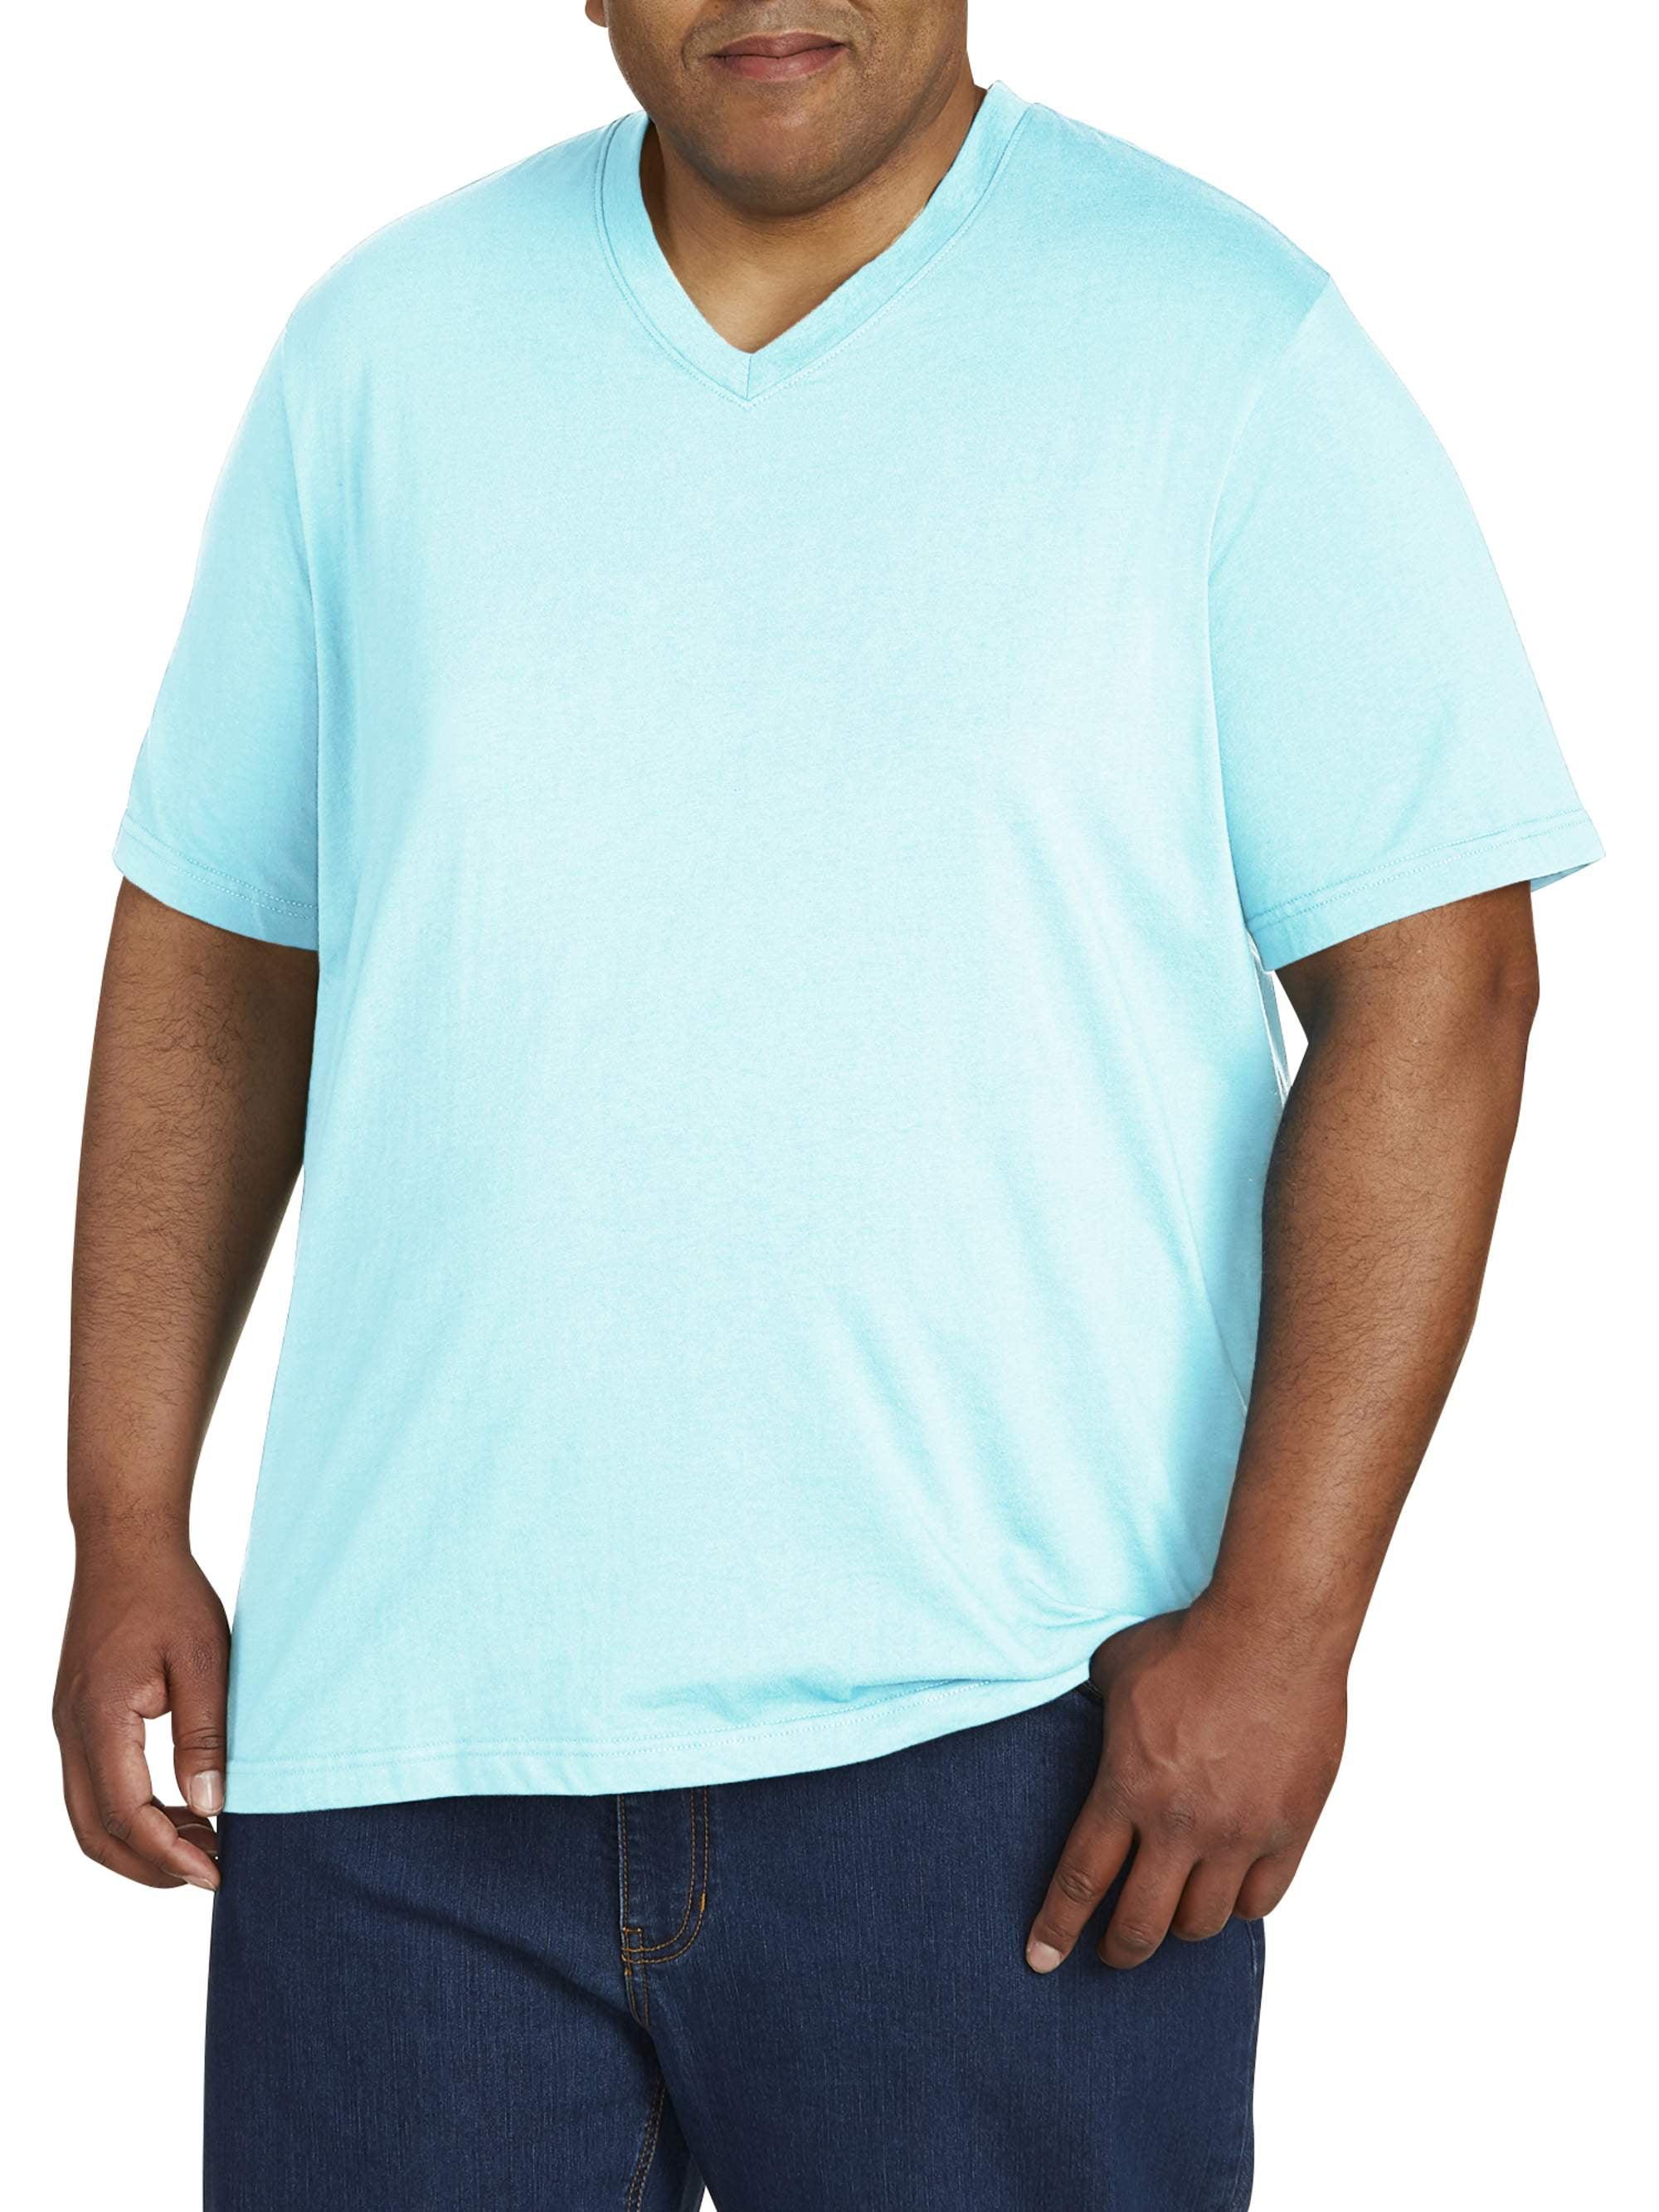 Men's Wicking Jersey Short Sleeve V Neck Tee